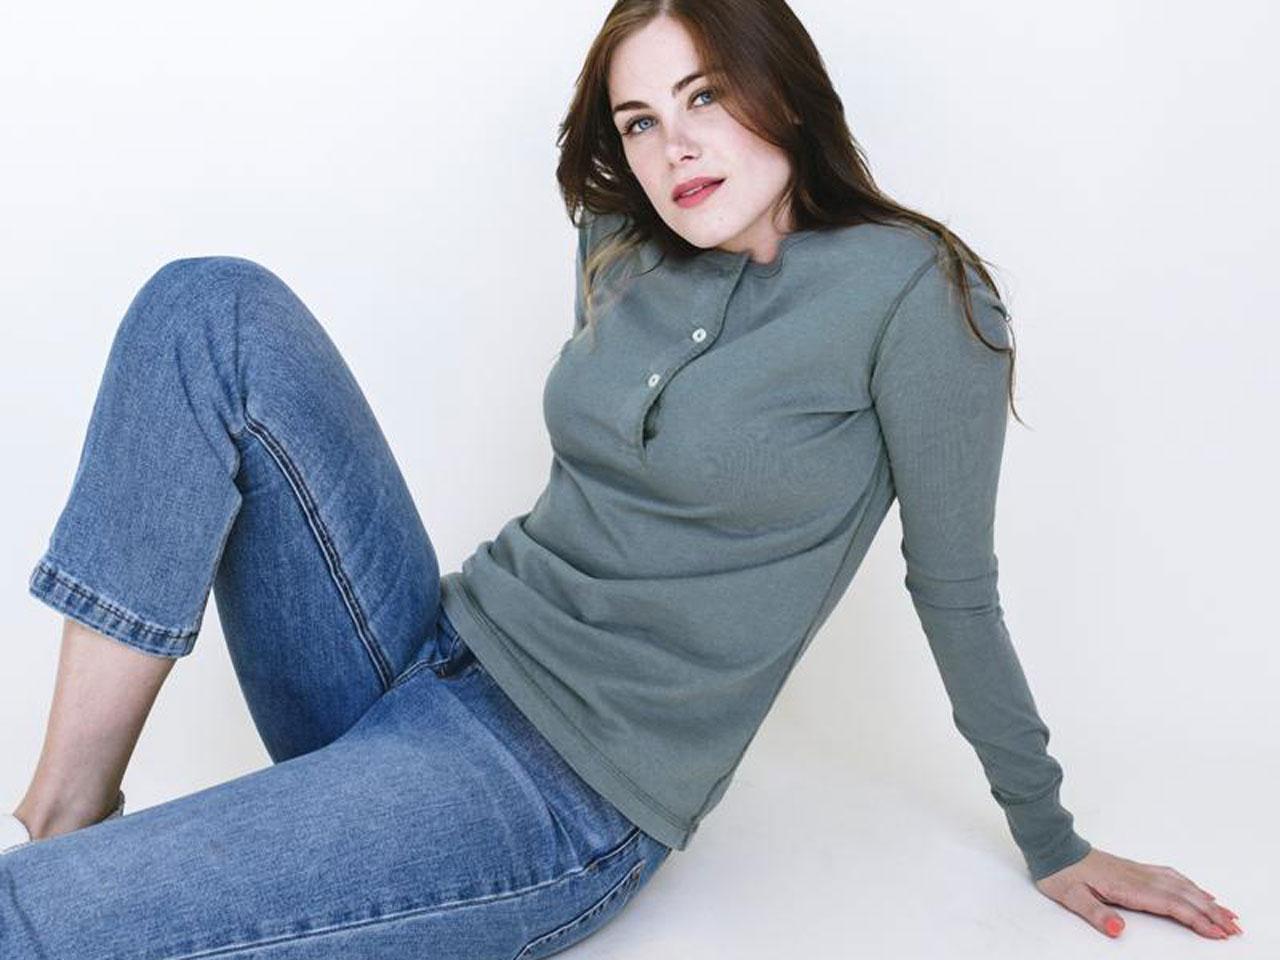 Tradlands | Essentials for Women | Shop Henley Deal